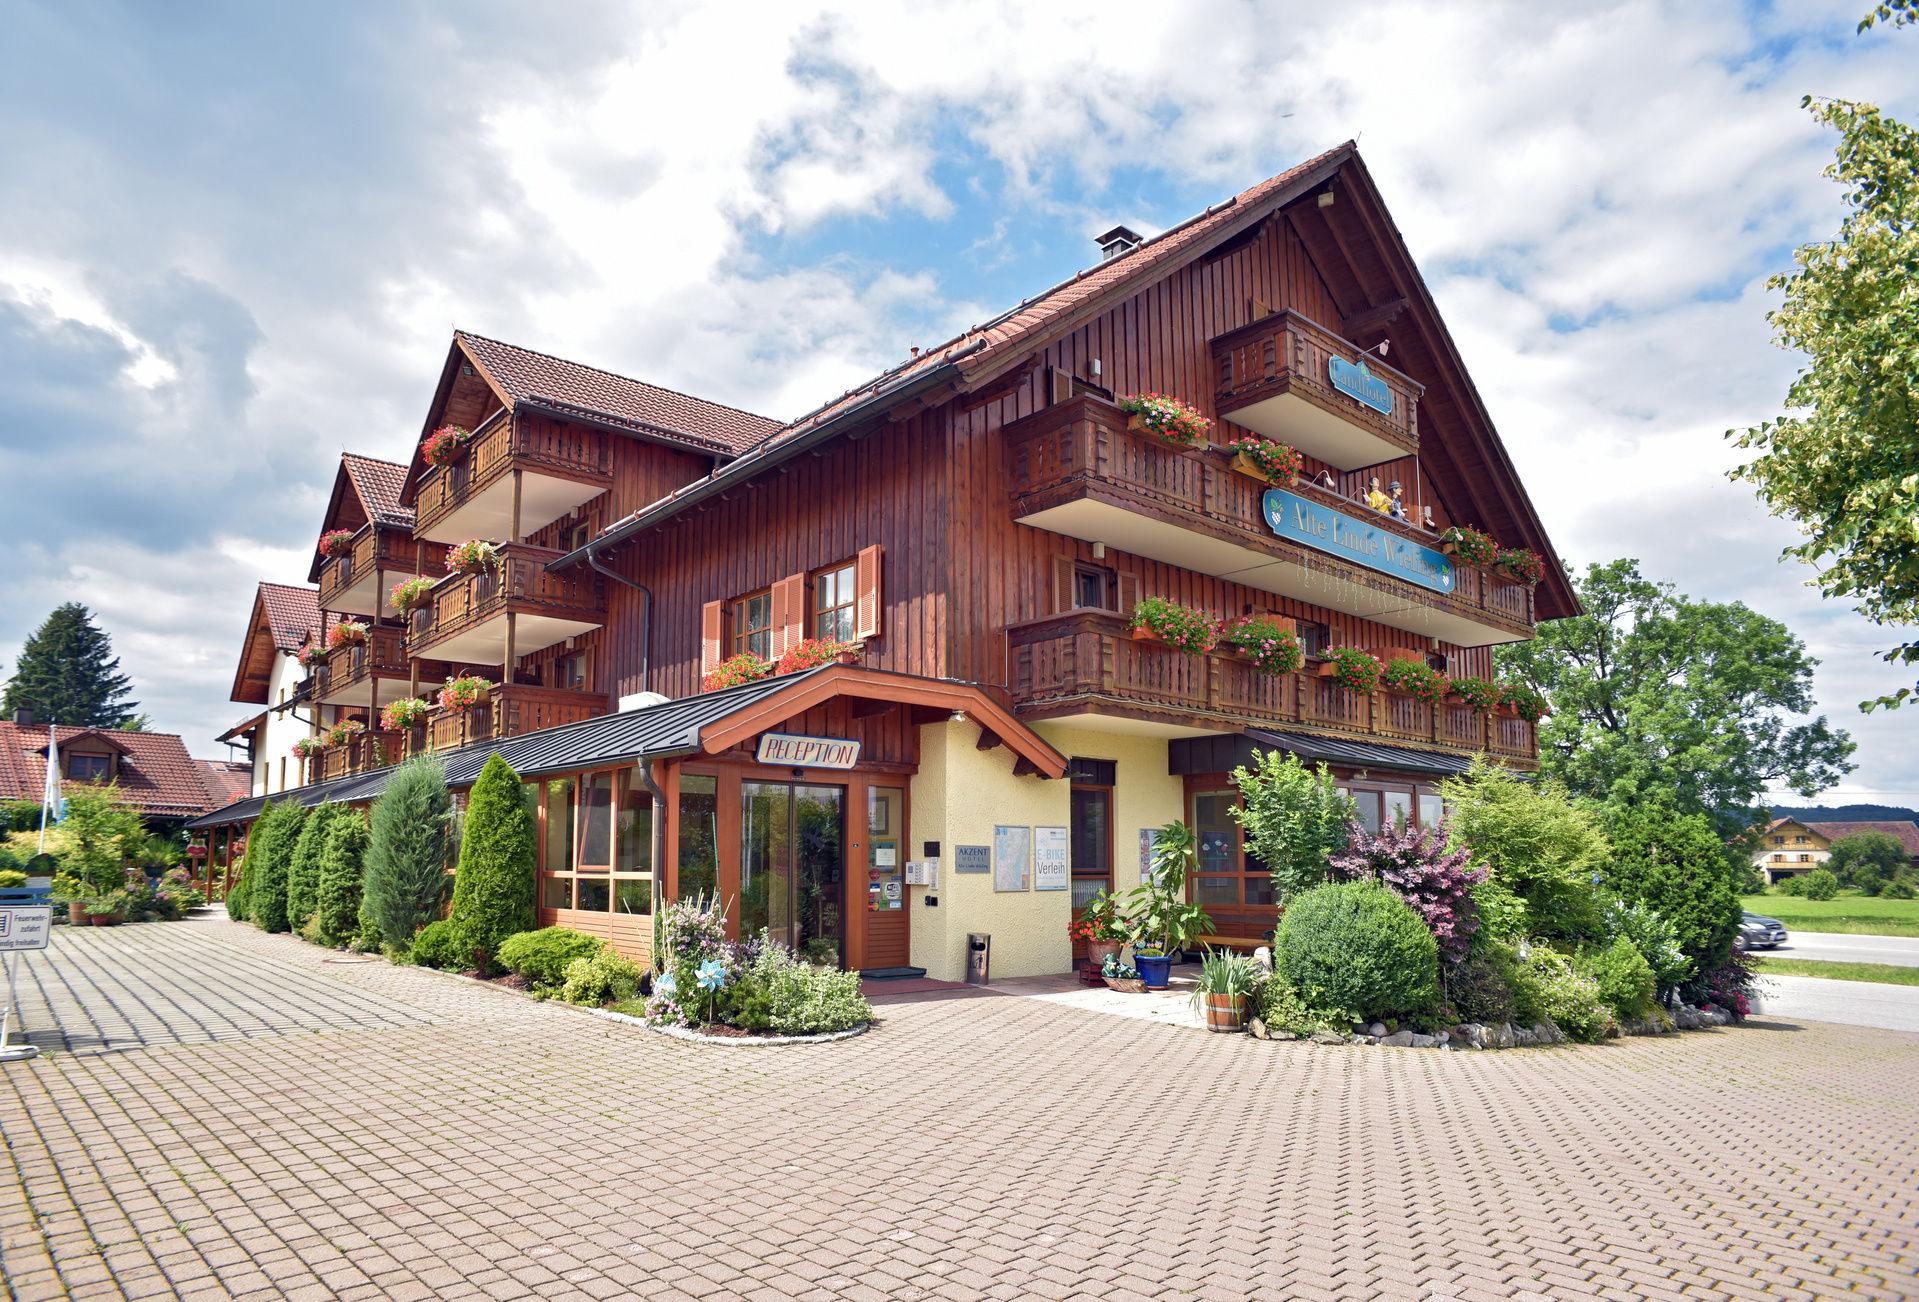 Akzent Hotel Alte Linde Wieling, Starnberg